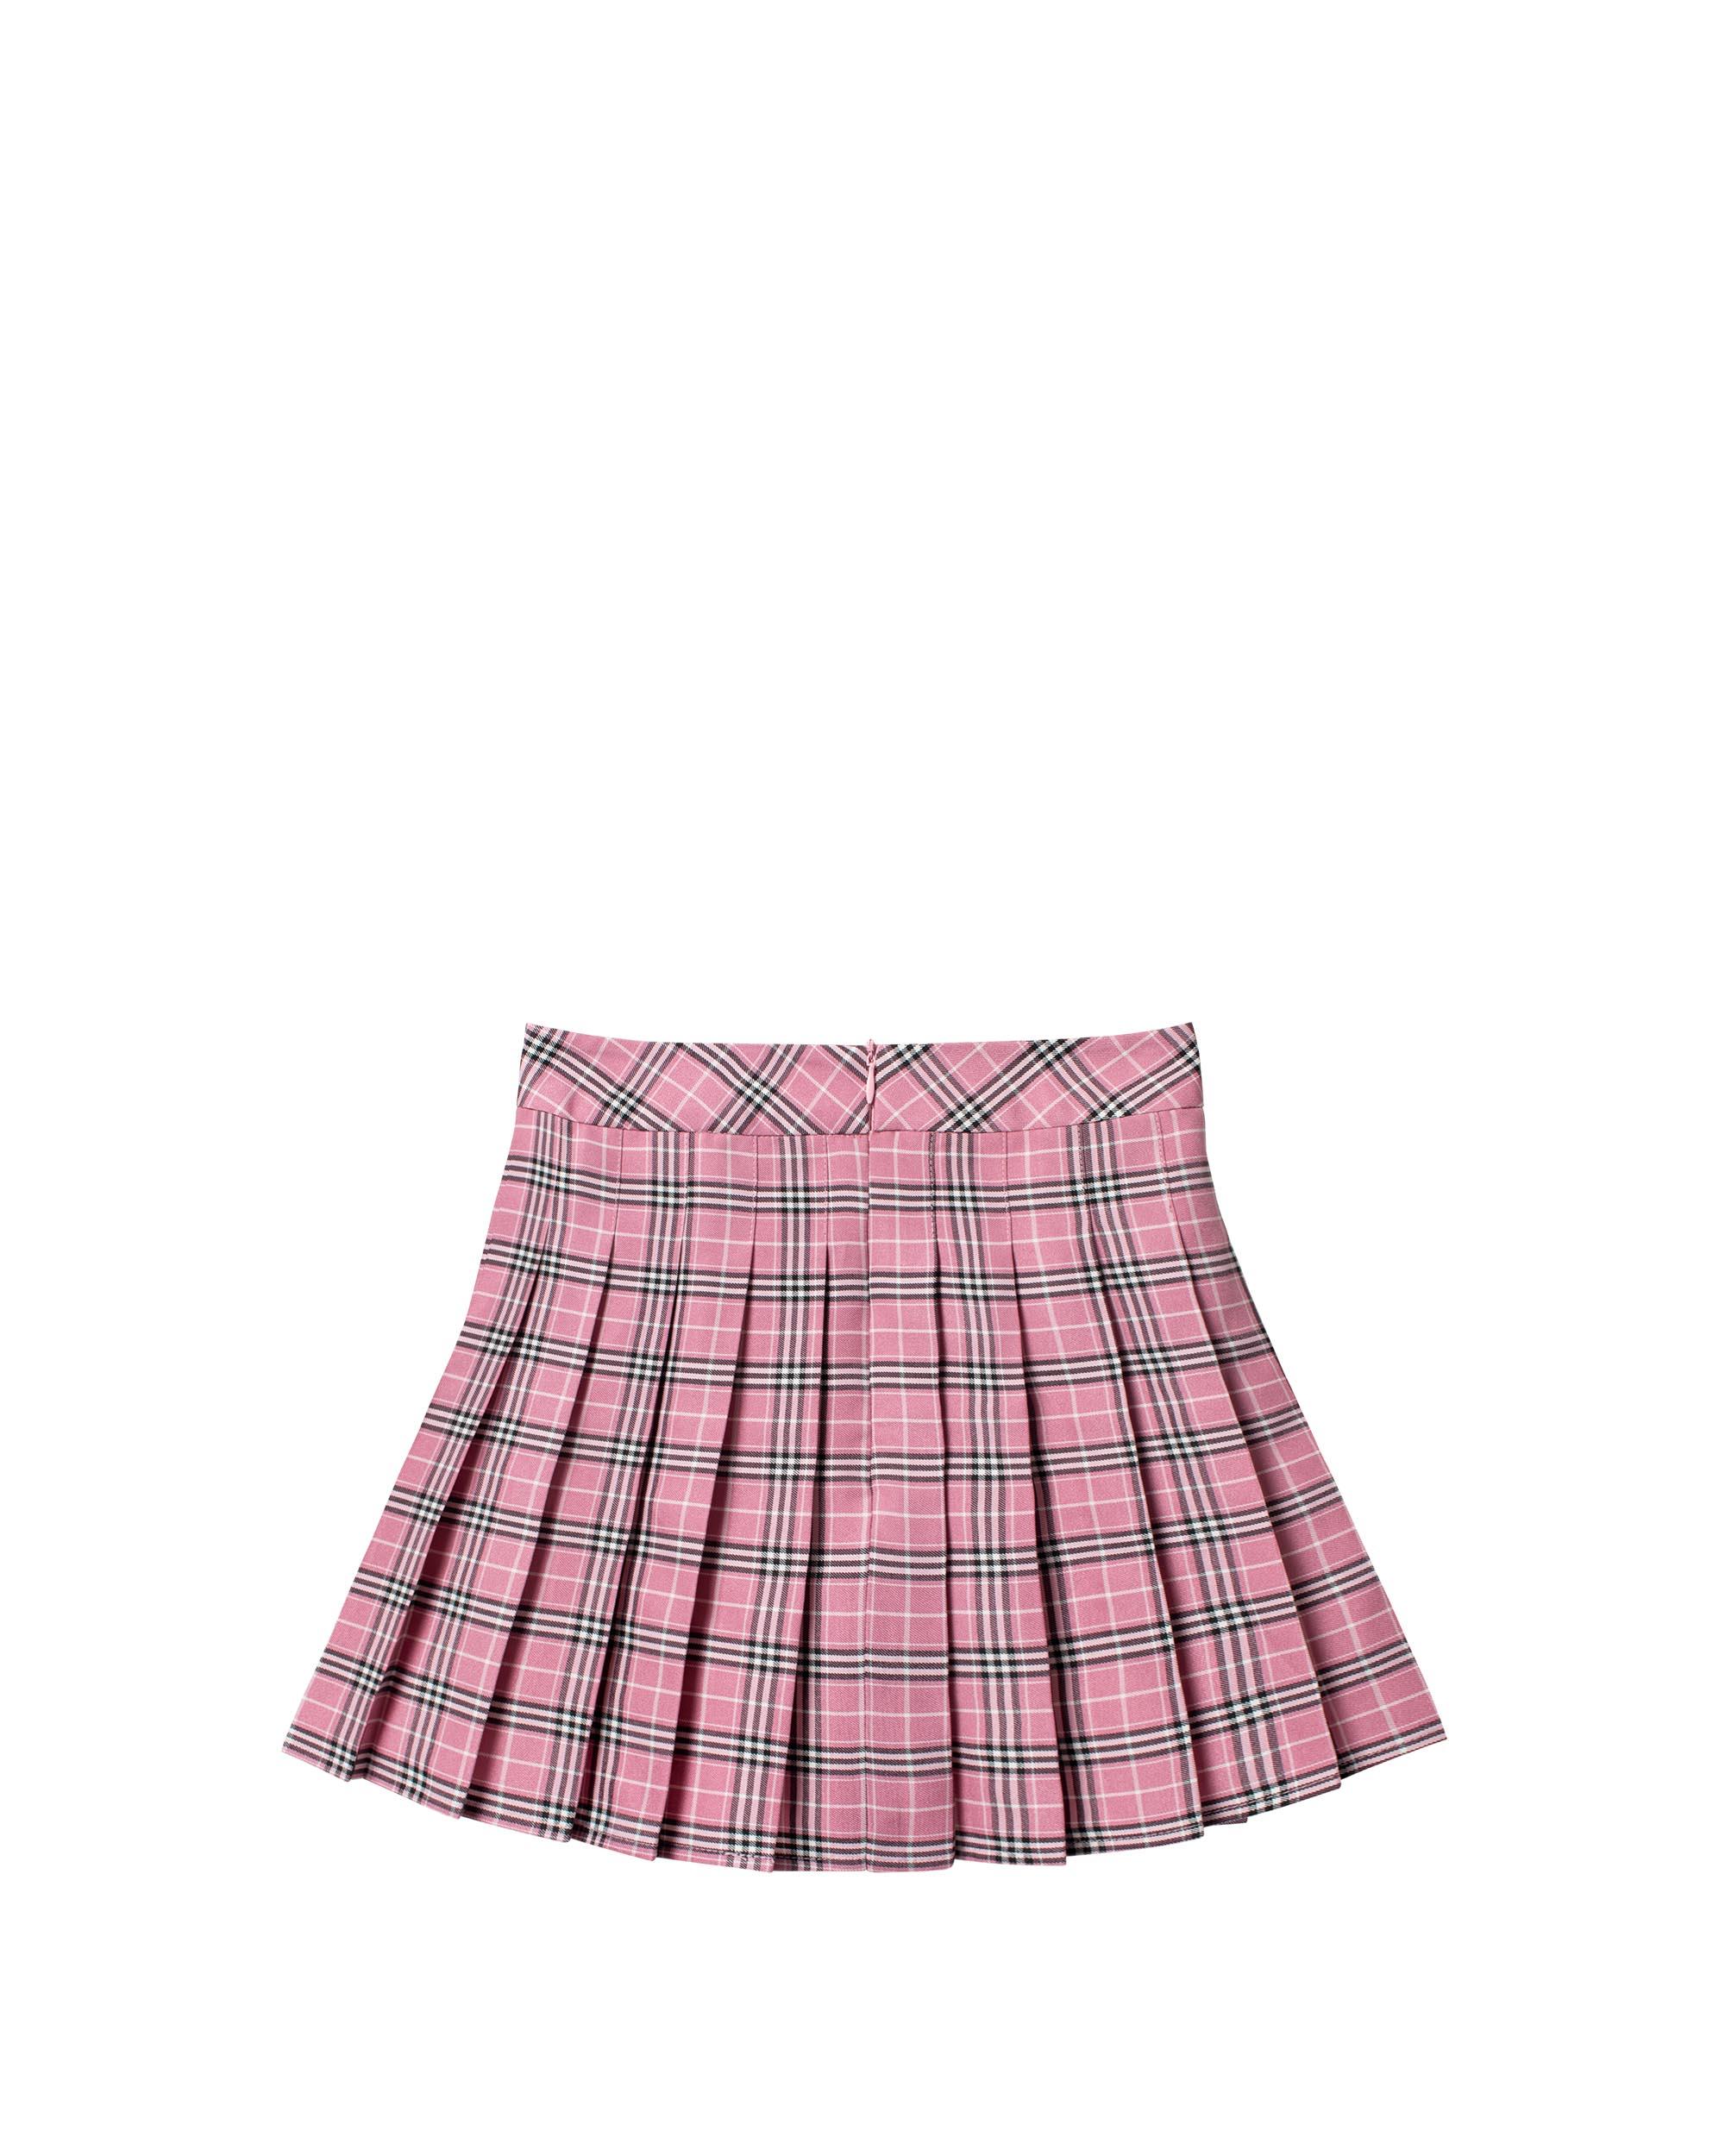 DirtyCoins Plaid Mini Skirt